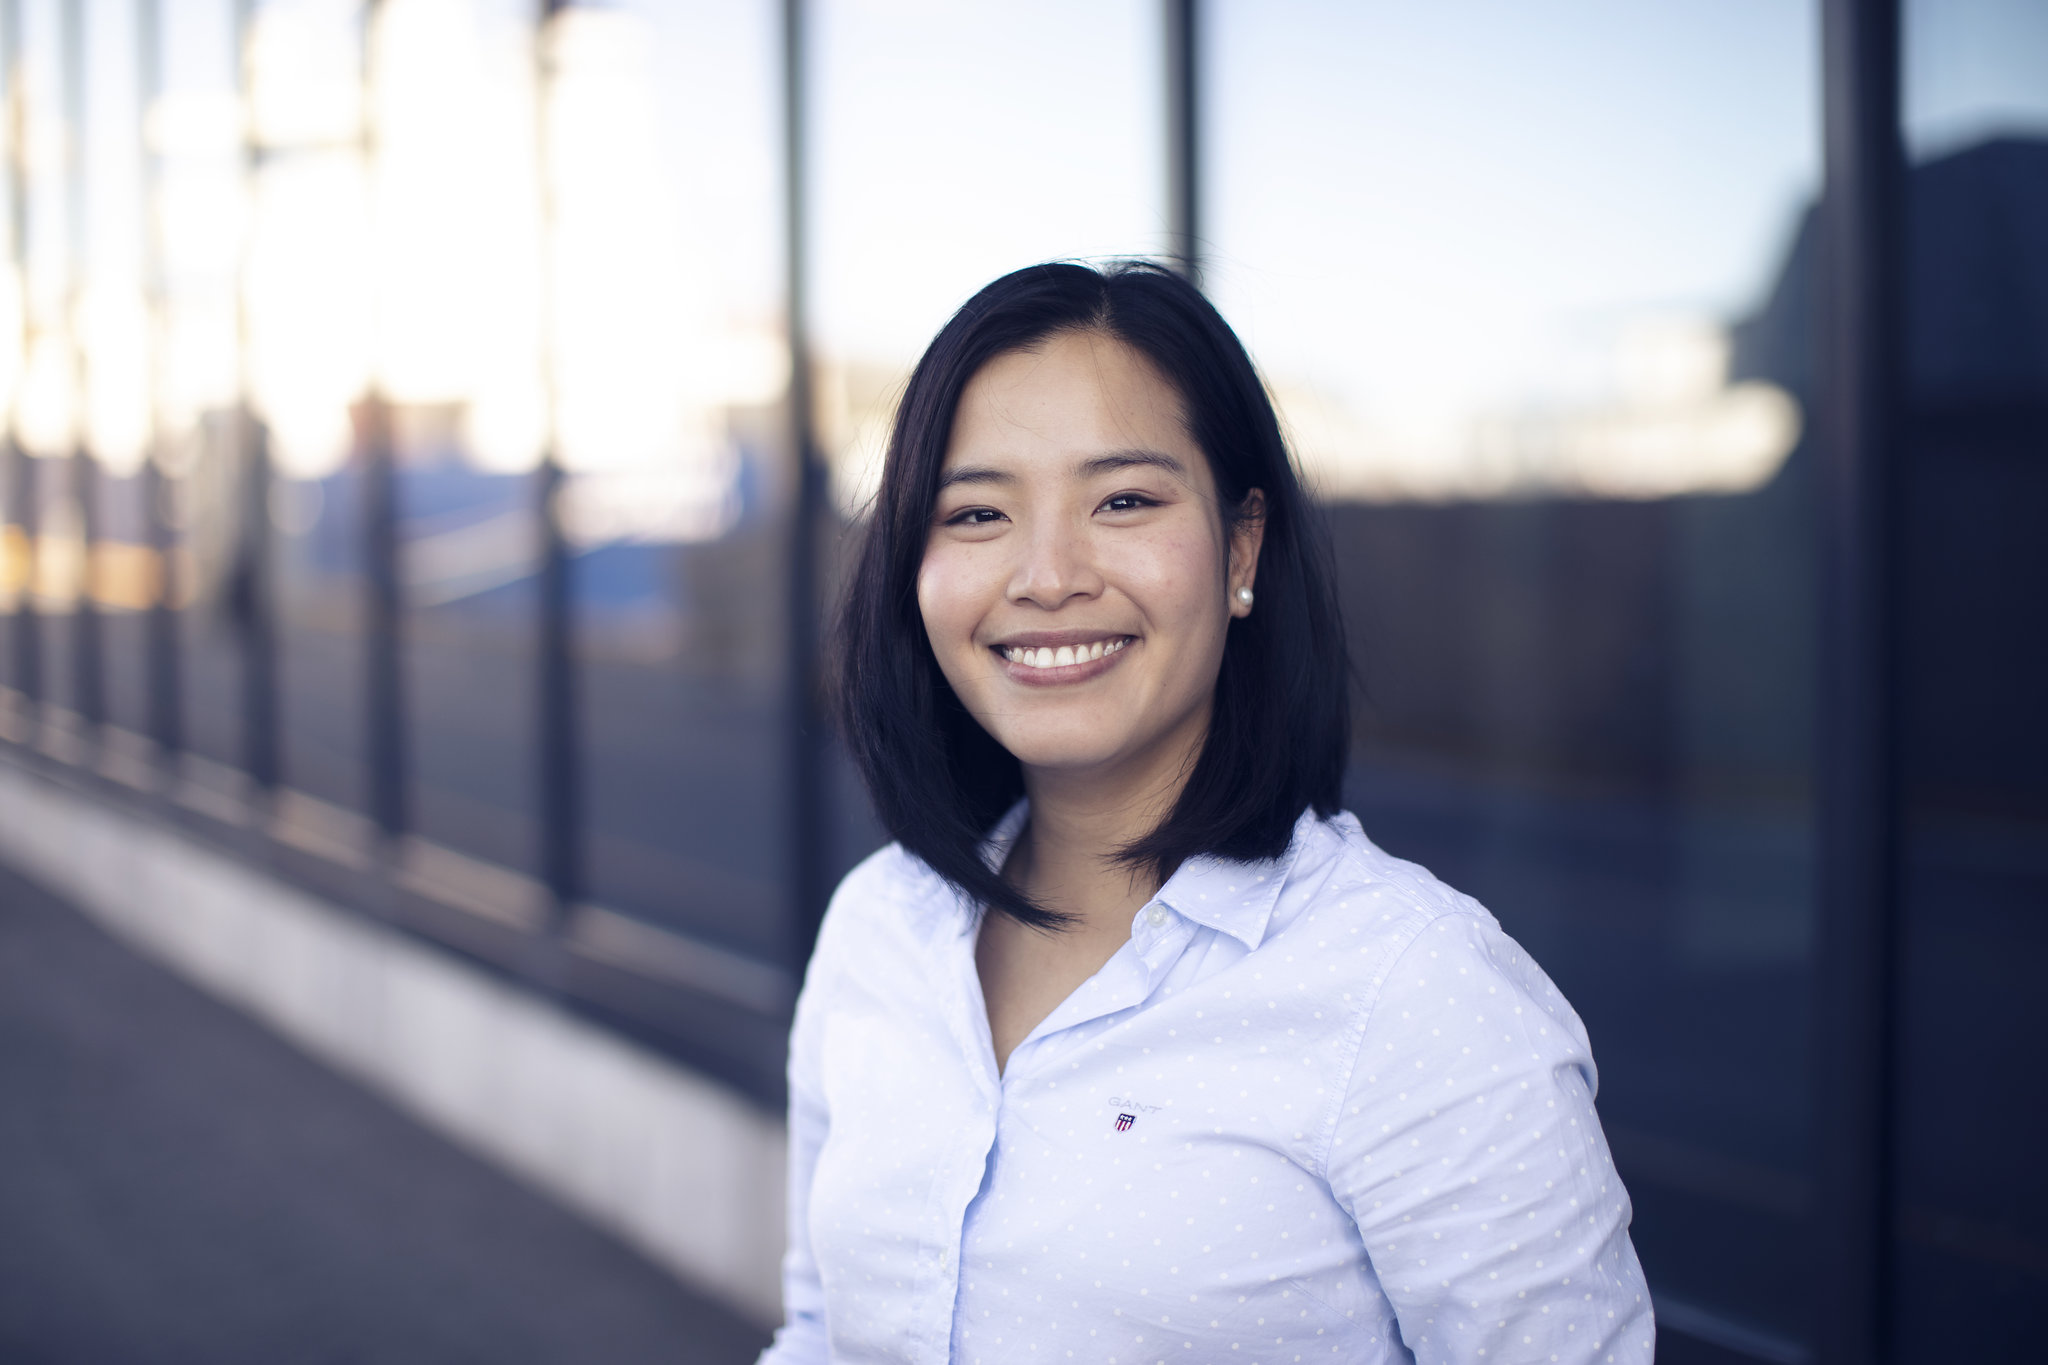 Anh Quynh Nguyen, kull 13